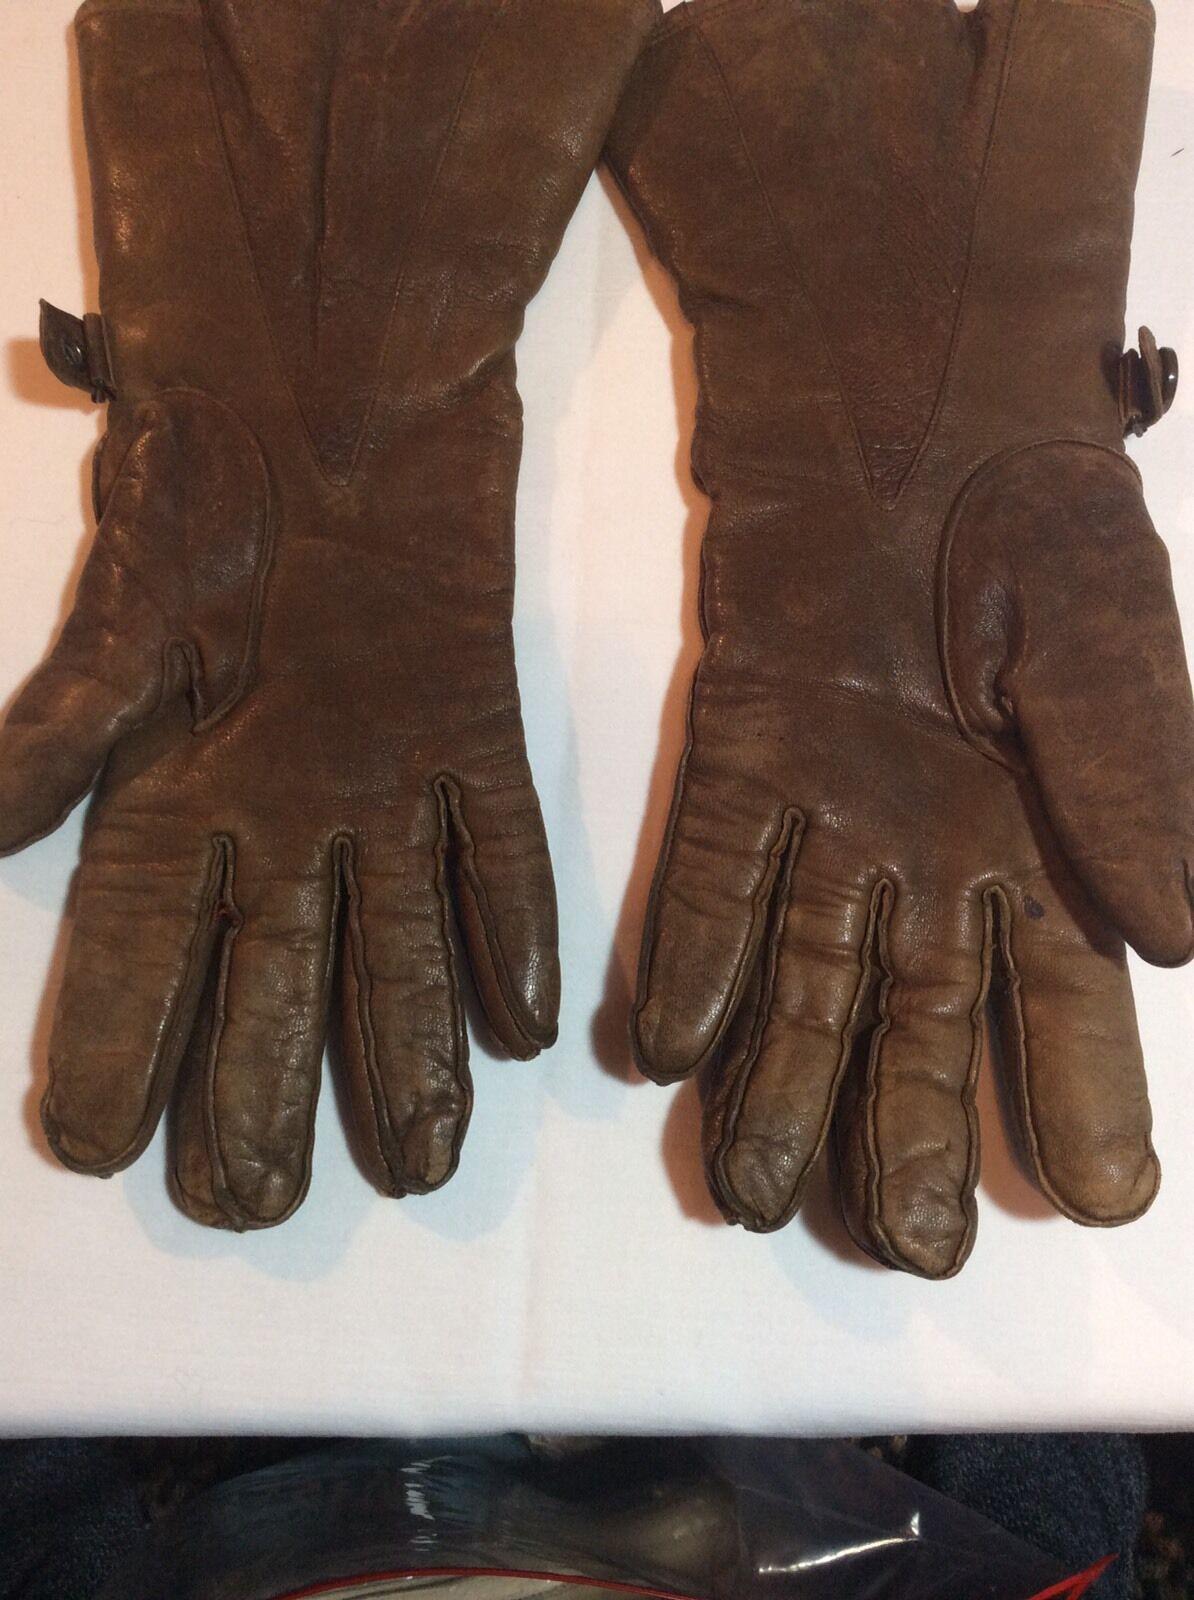 Vintage Hansen Ladies Leather Gauntlet Gloves - image 6